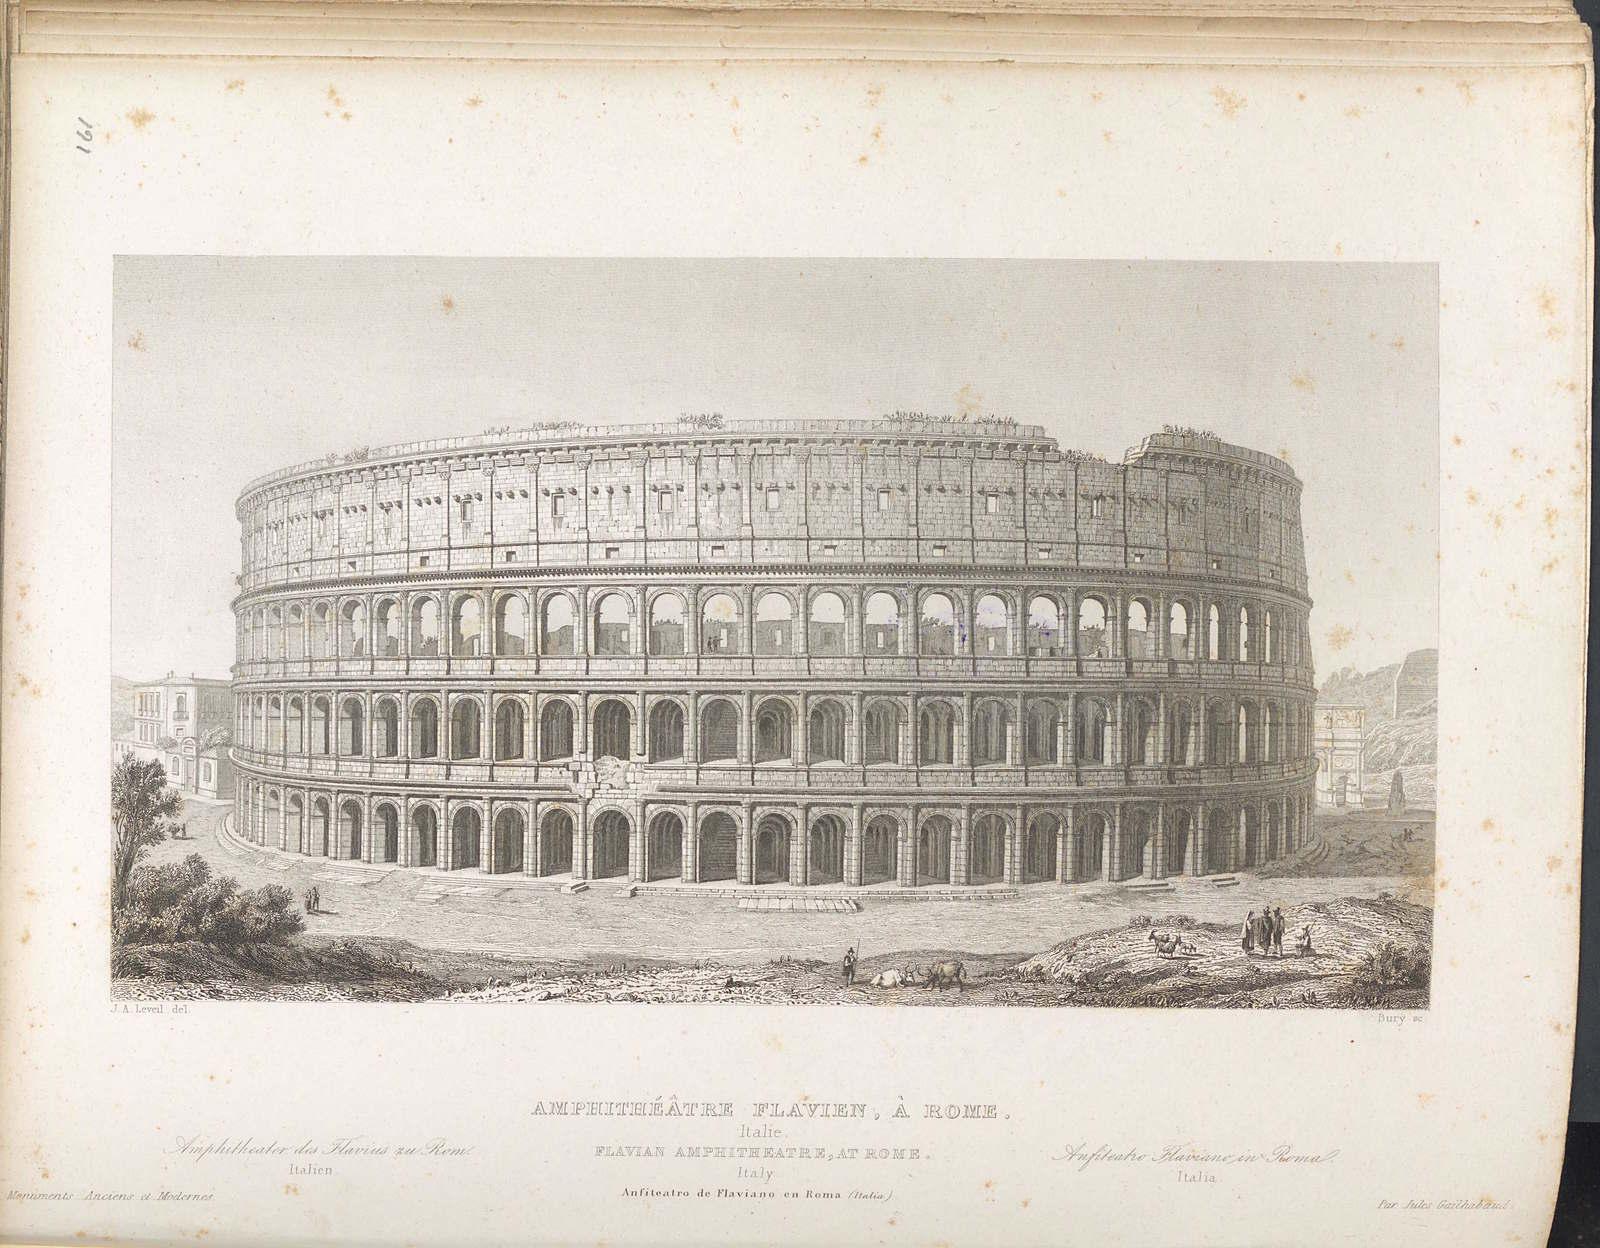 The Flavian Amphitheater, Rome, Italy